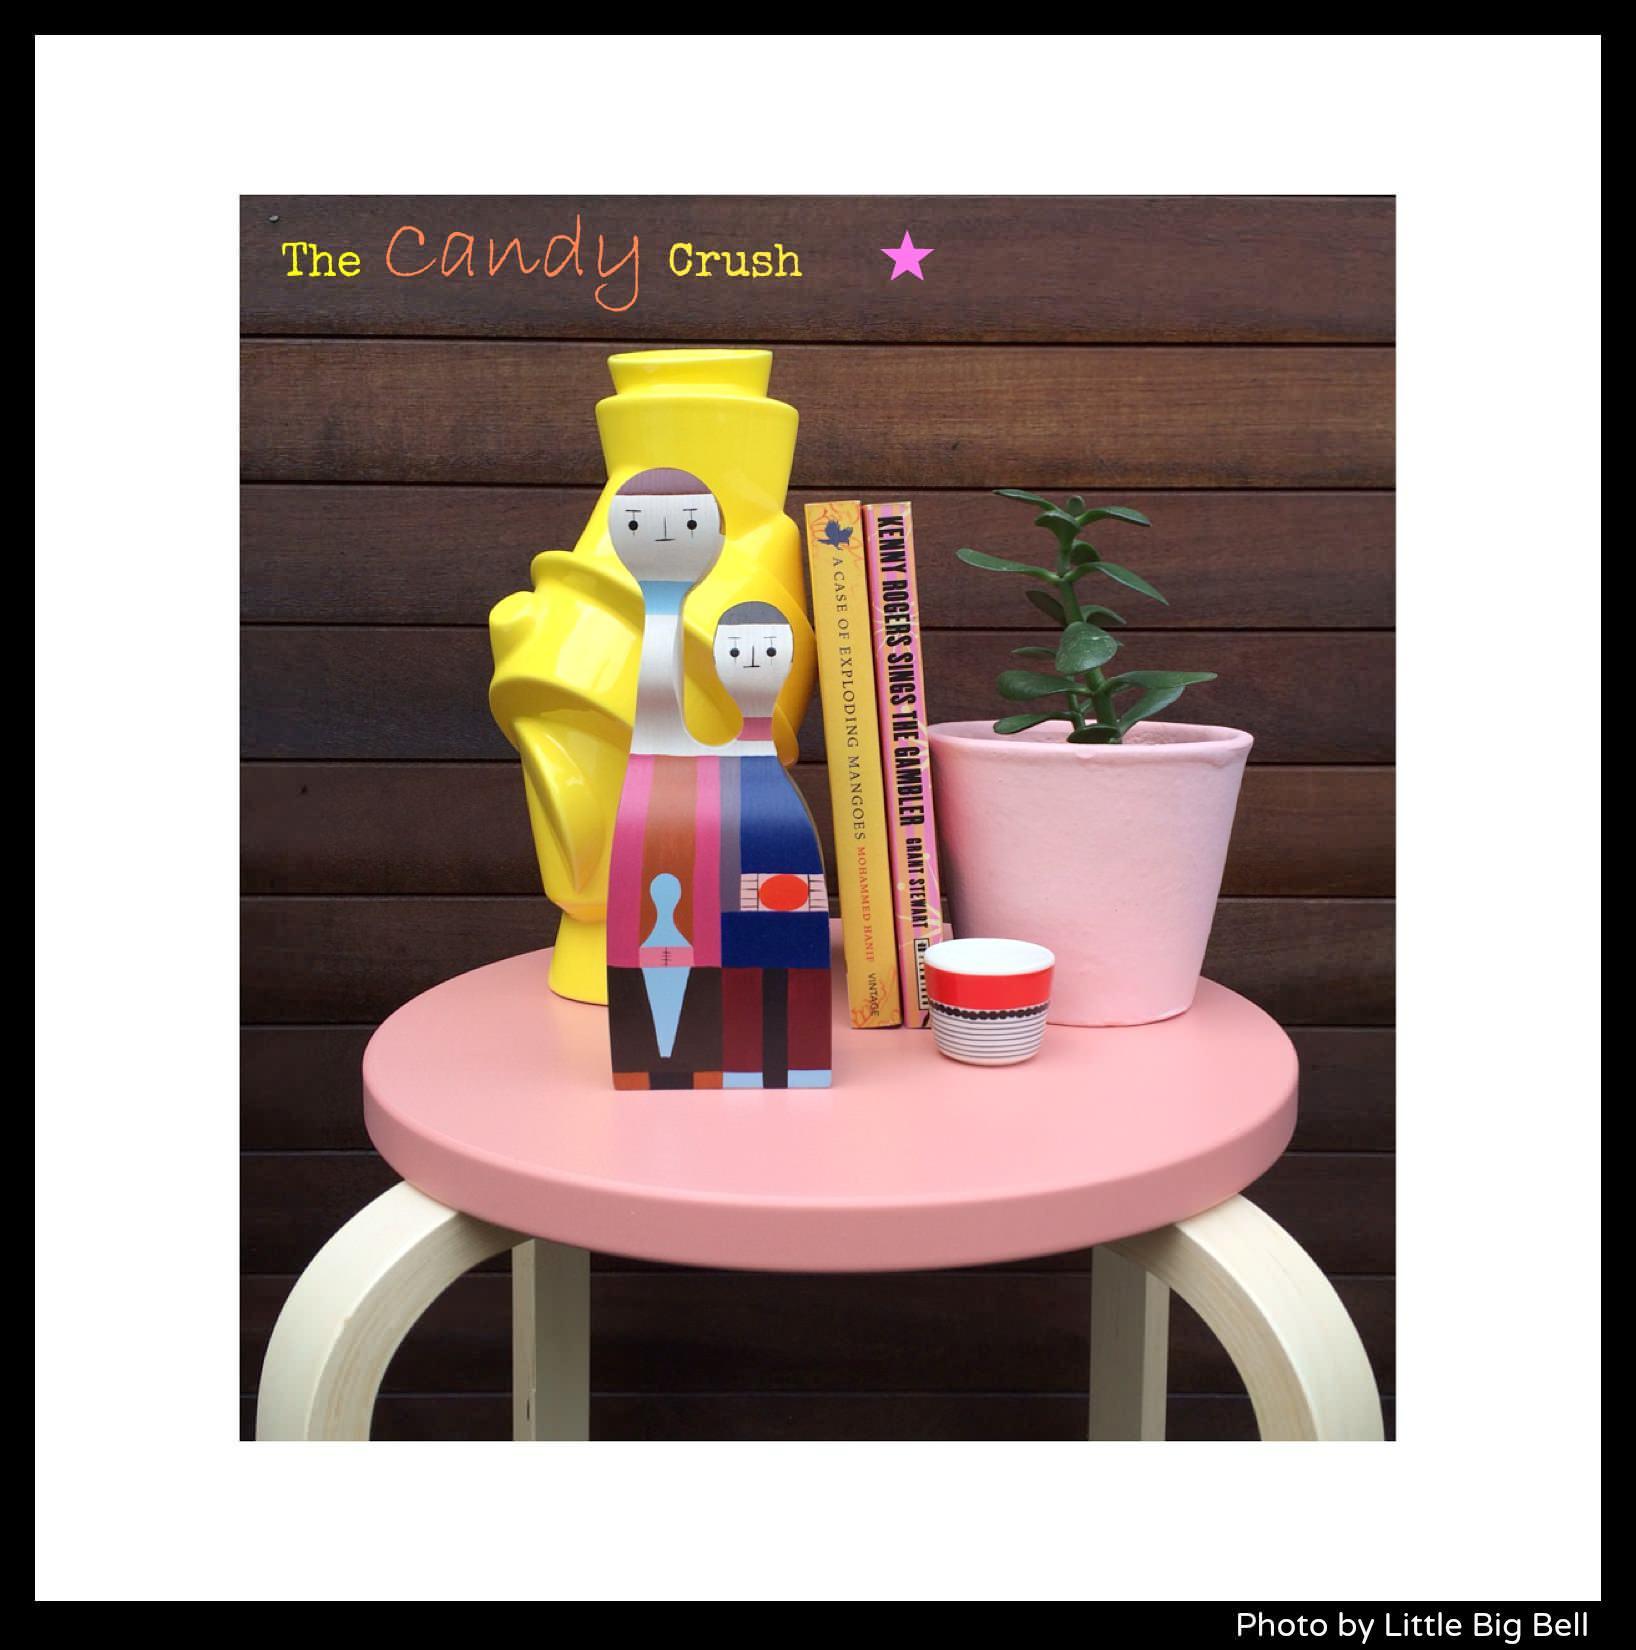 Bright-Bazaar-Candy-Crush-created-by-Geraldine-Little-Big-Bell.jpg.jpg